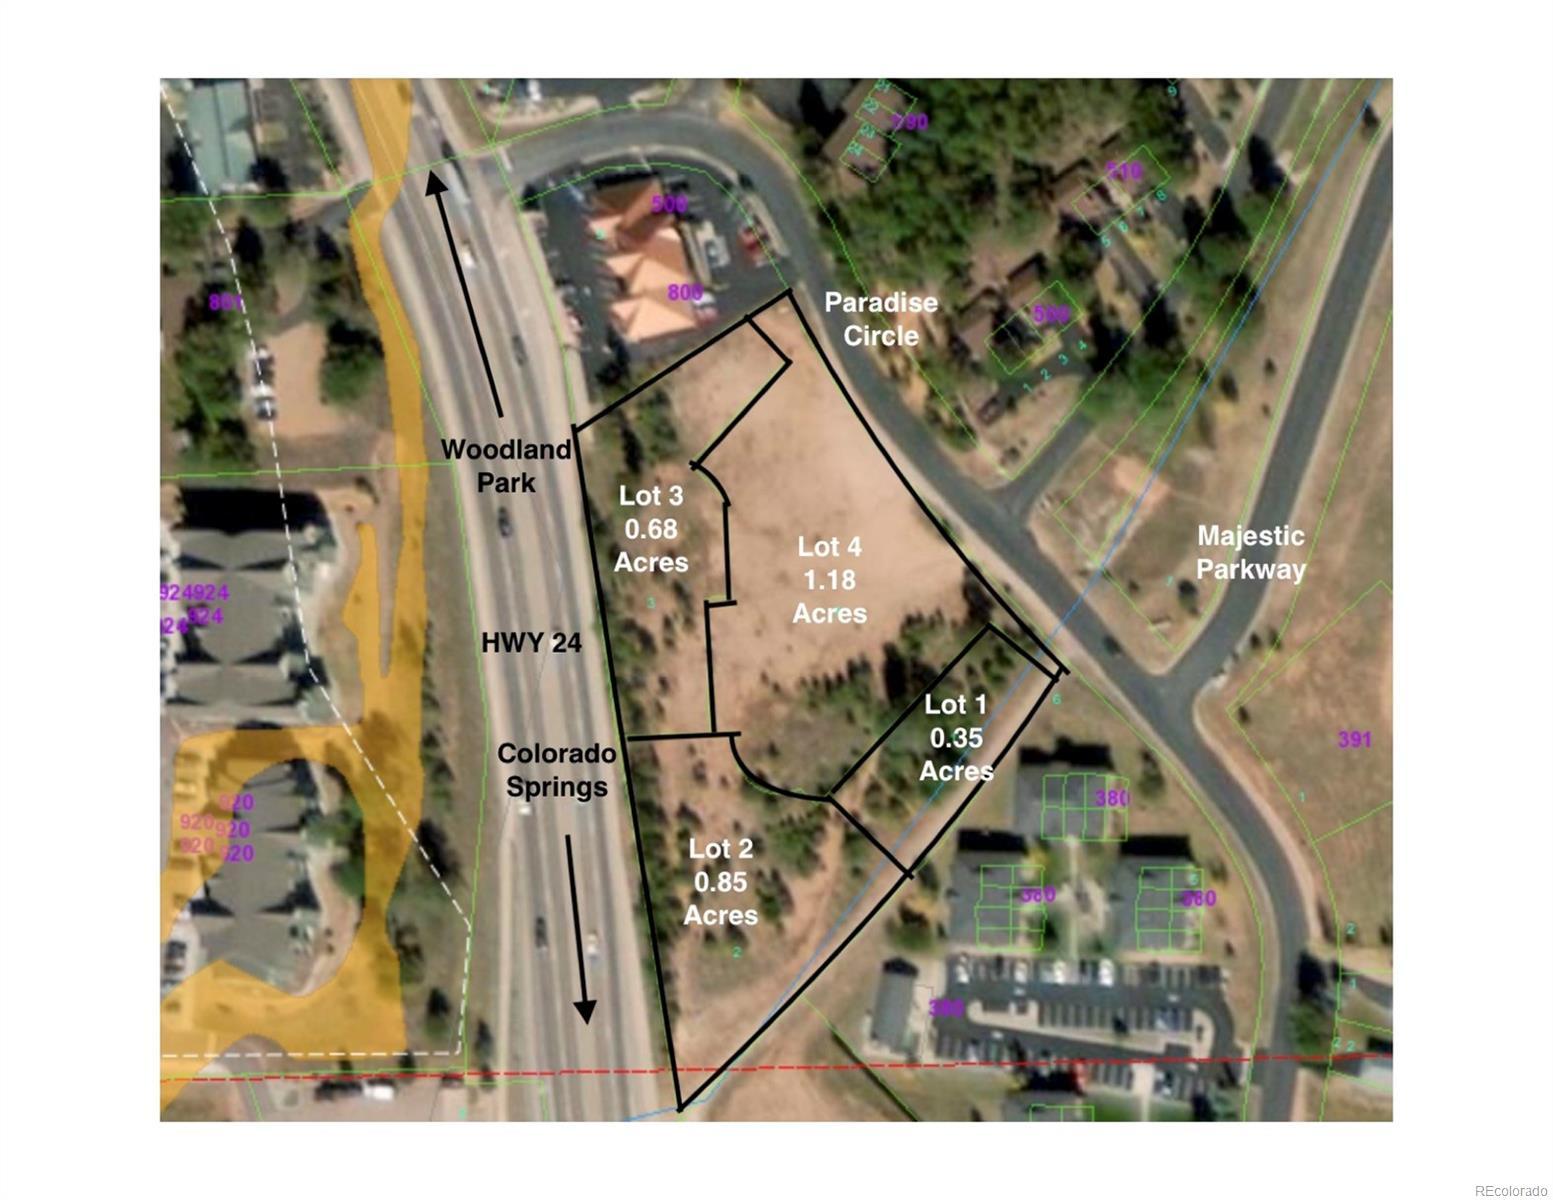 HWY 24 & Paradise Circle, Woodland Park, CO 80813 - Woodland Park, CO real estate listing